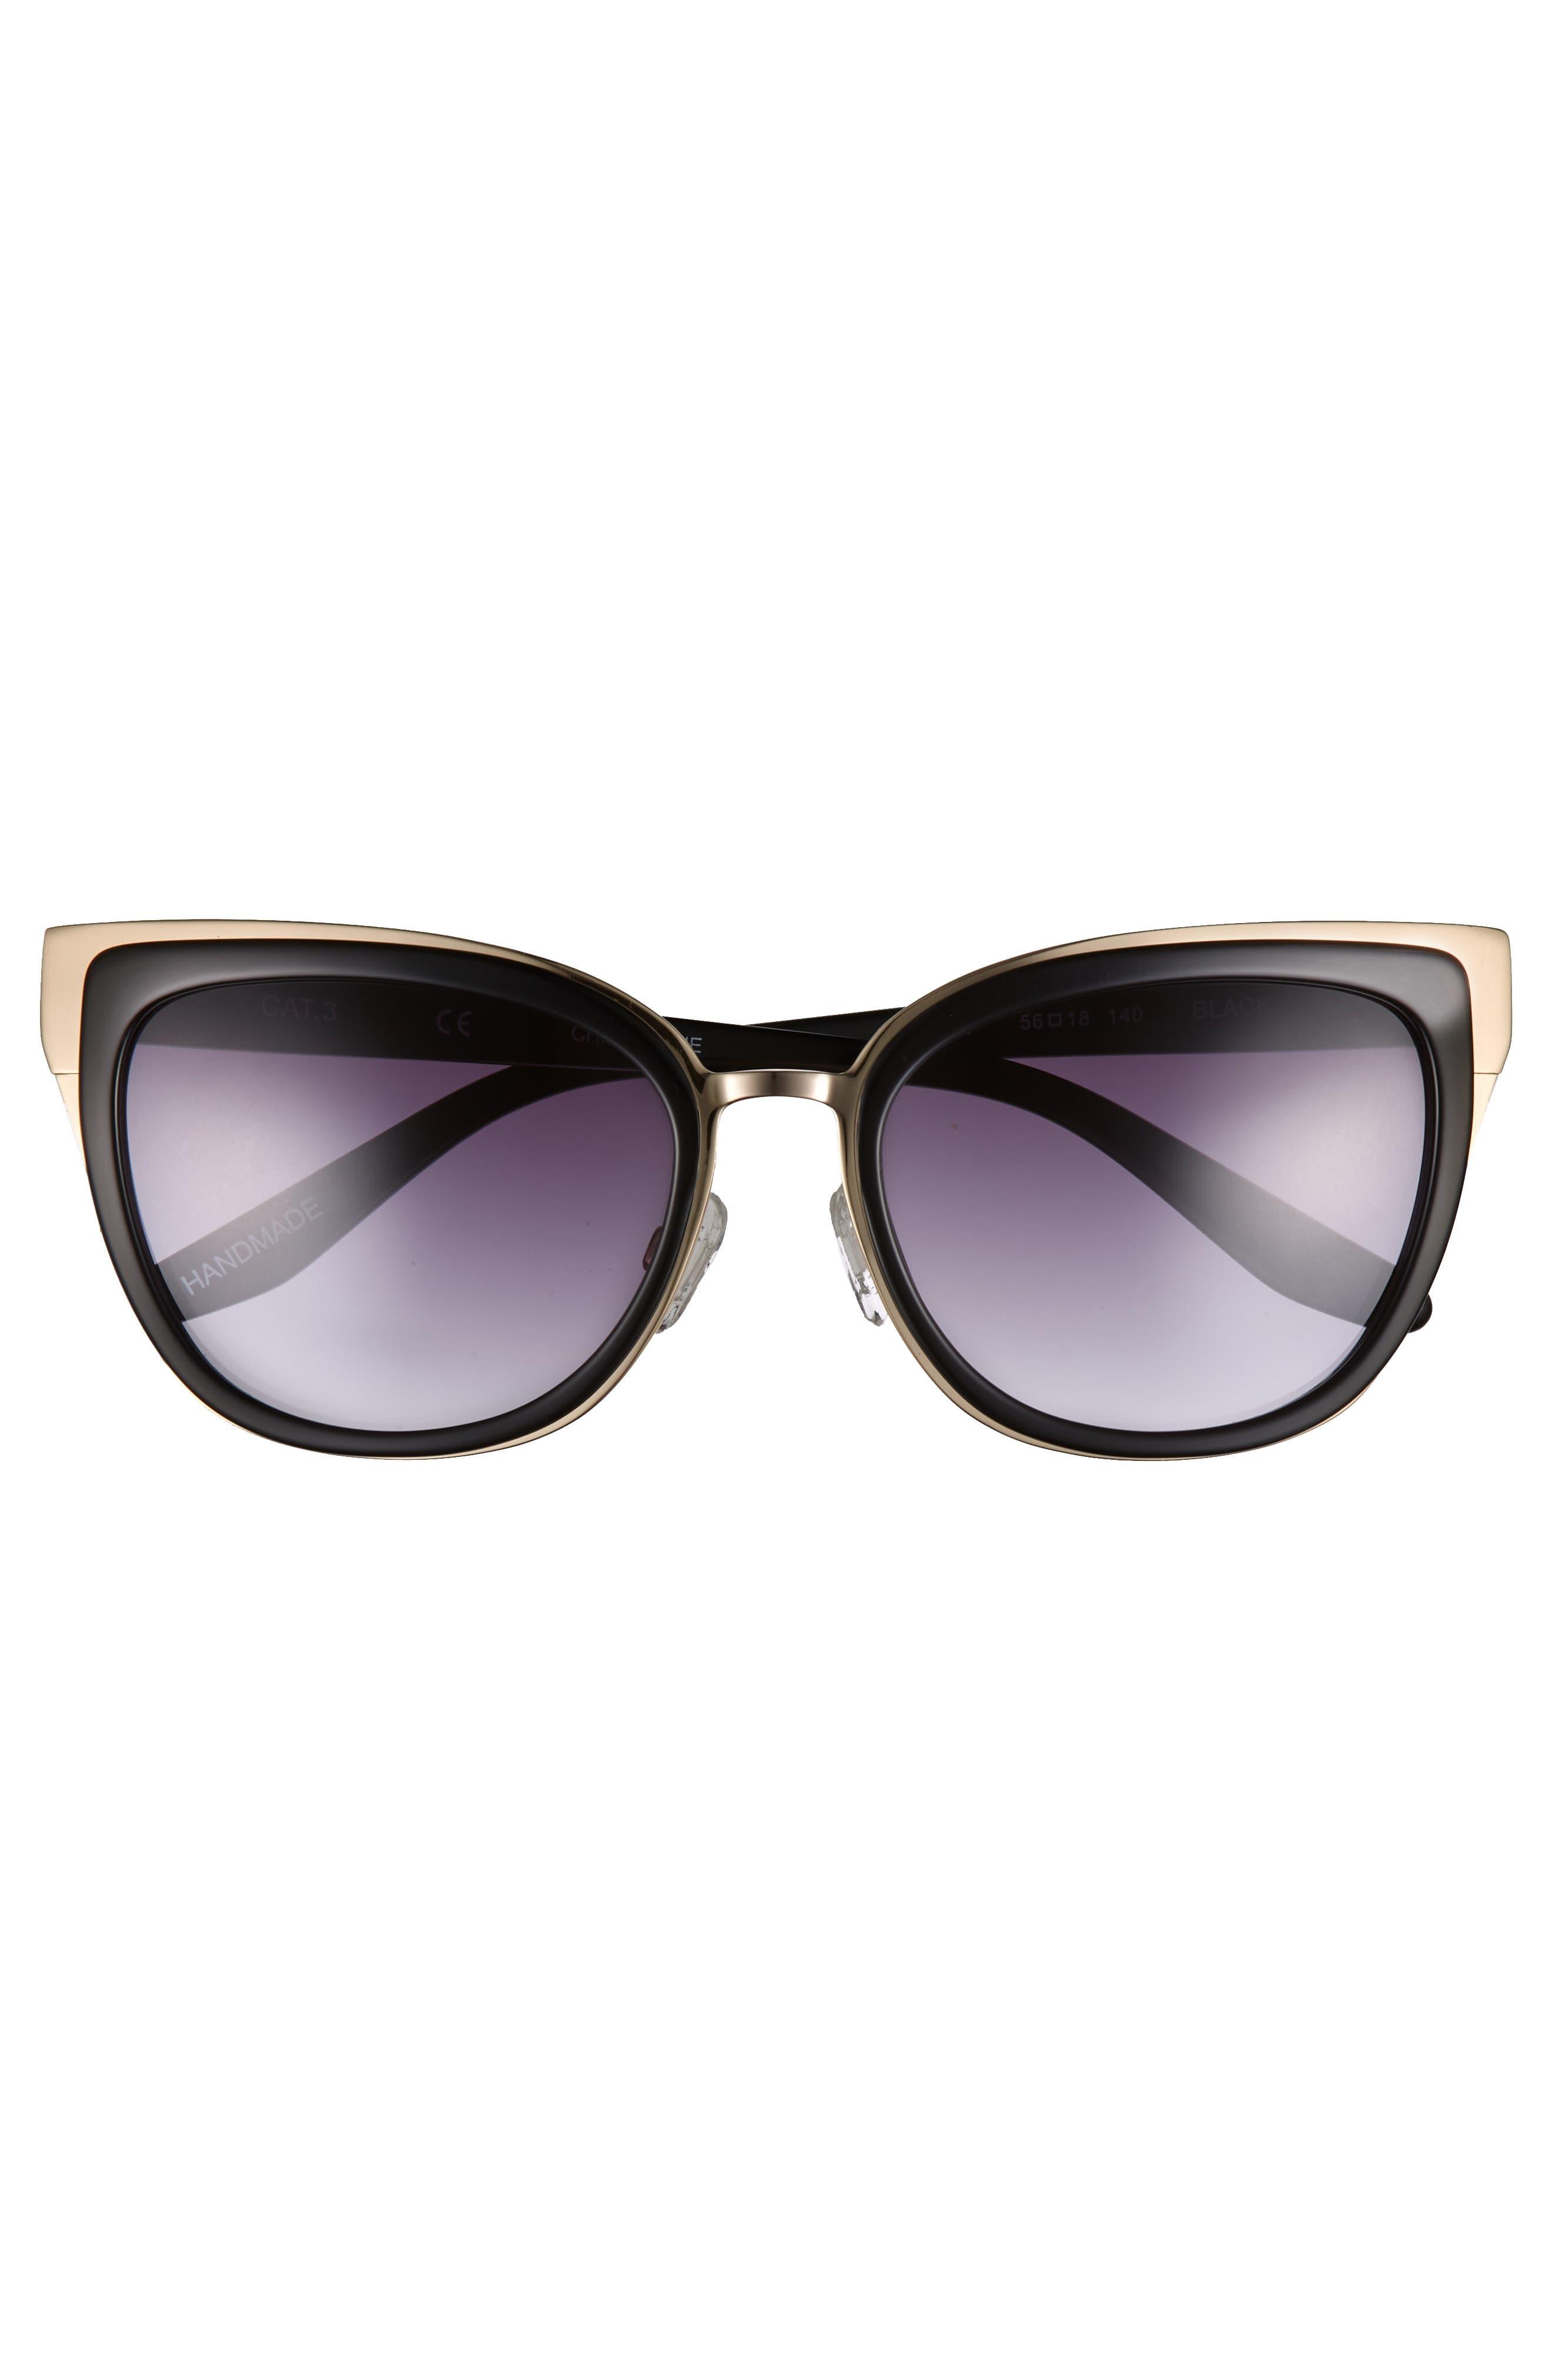 Lillian 56mm Sunglasses,                             Alternate thumbnail 3, color,                             001